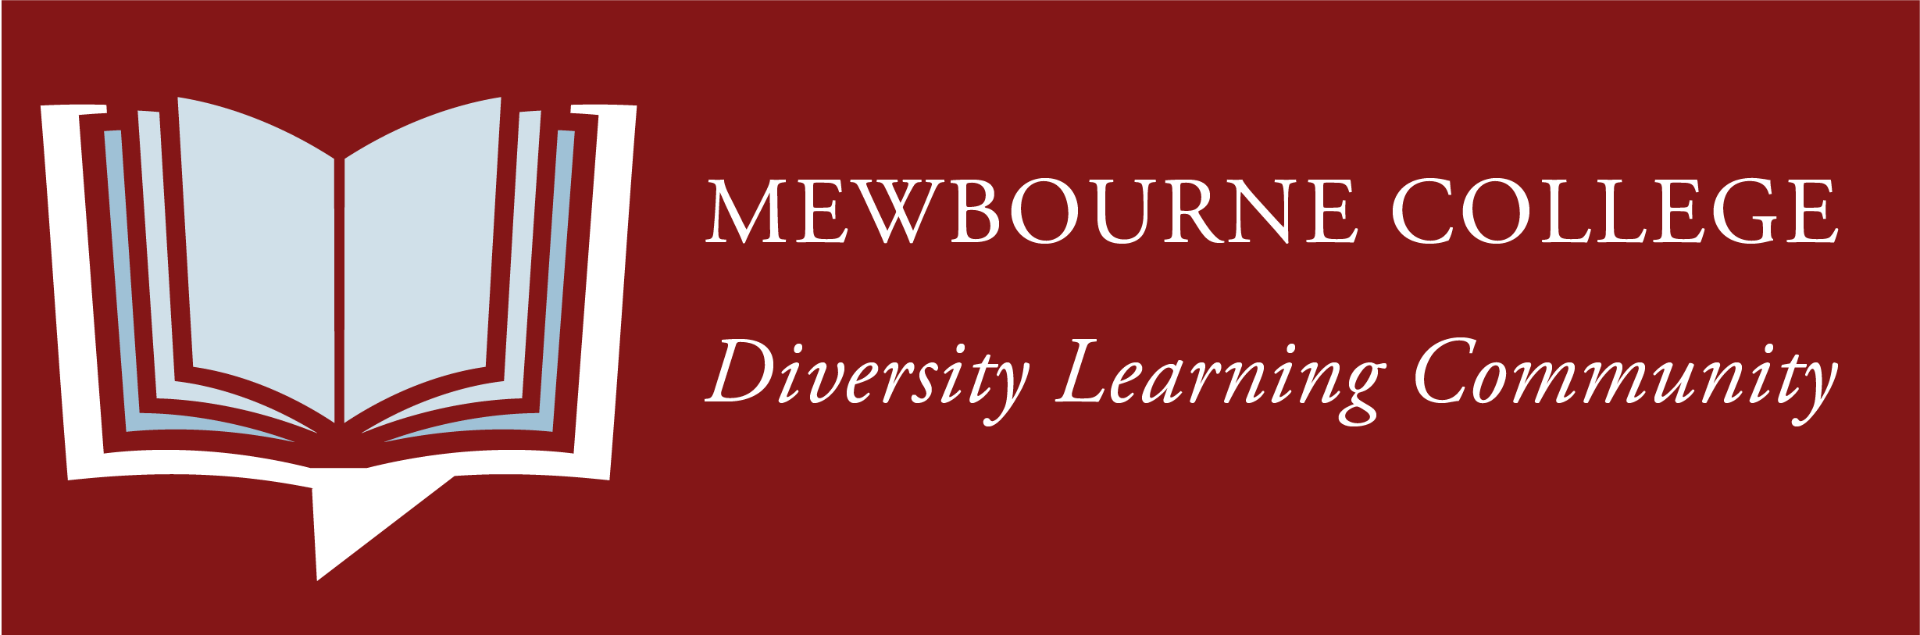 diversity learning community